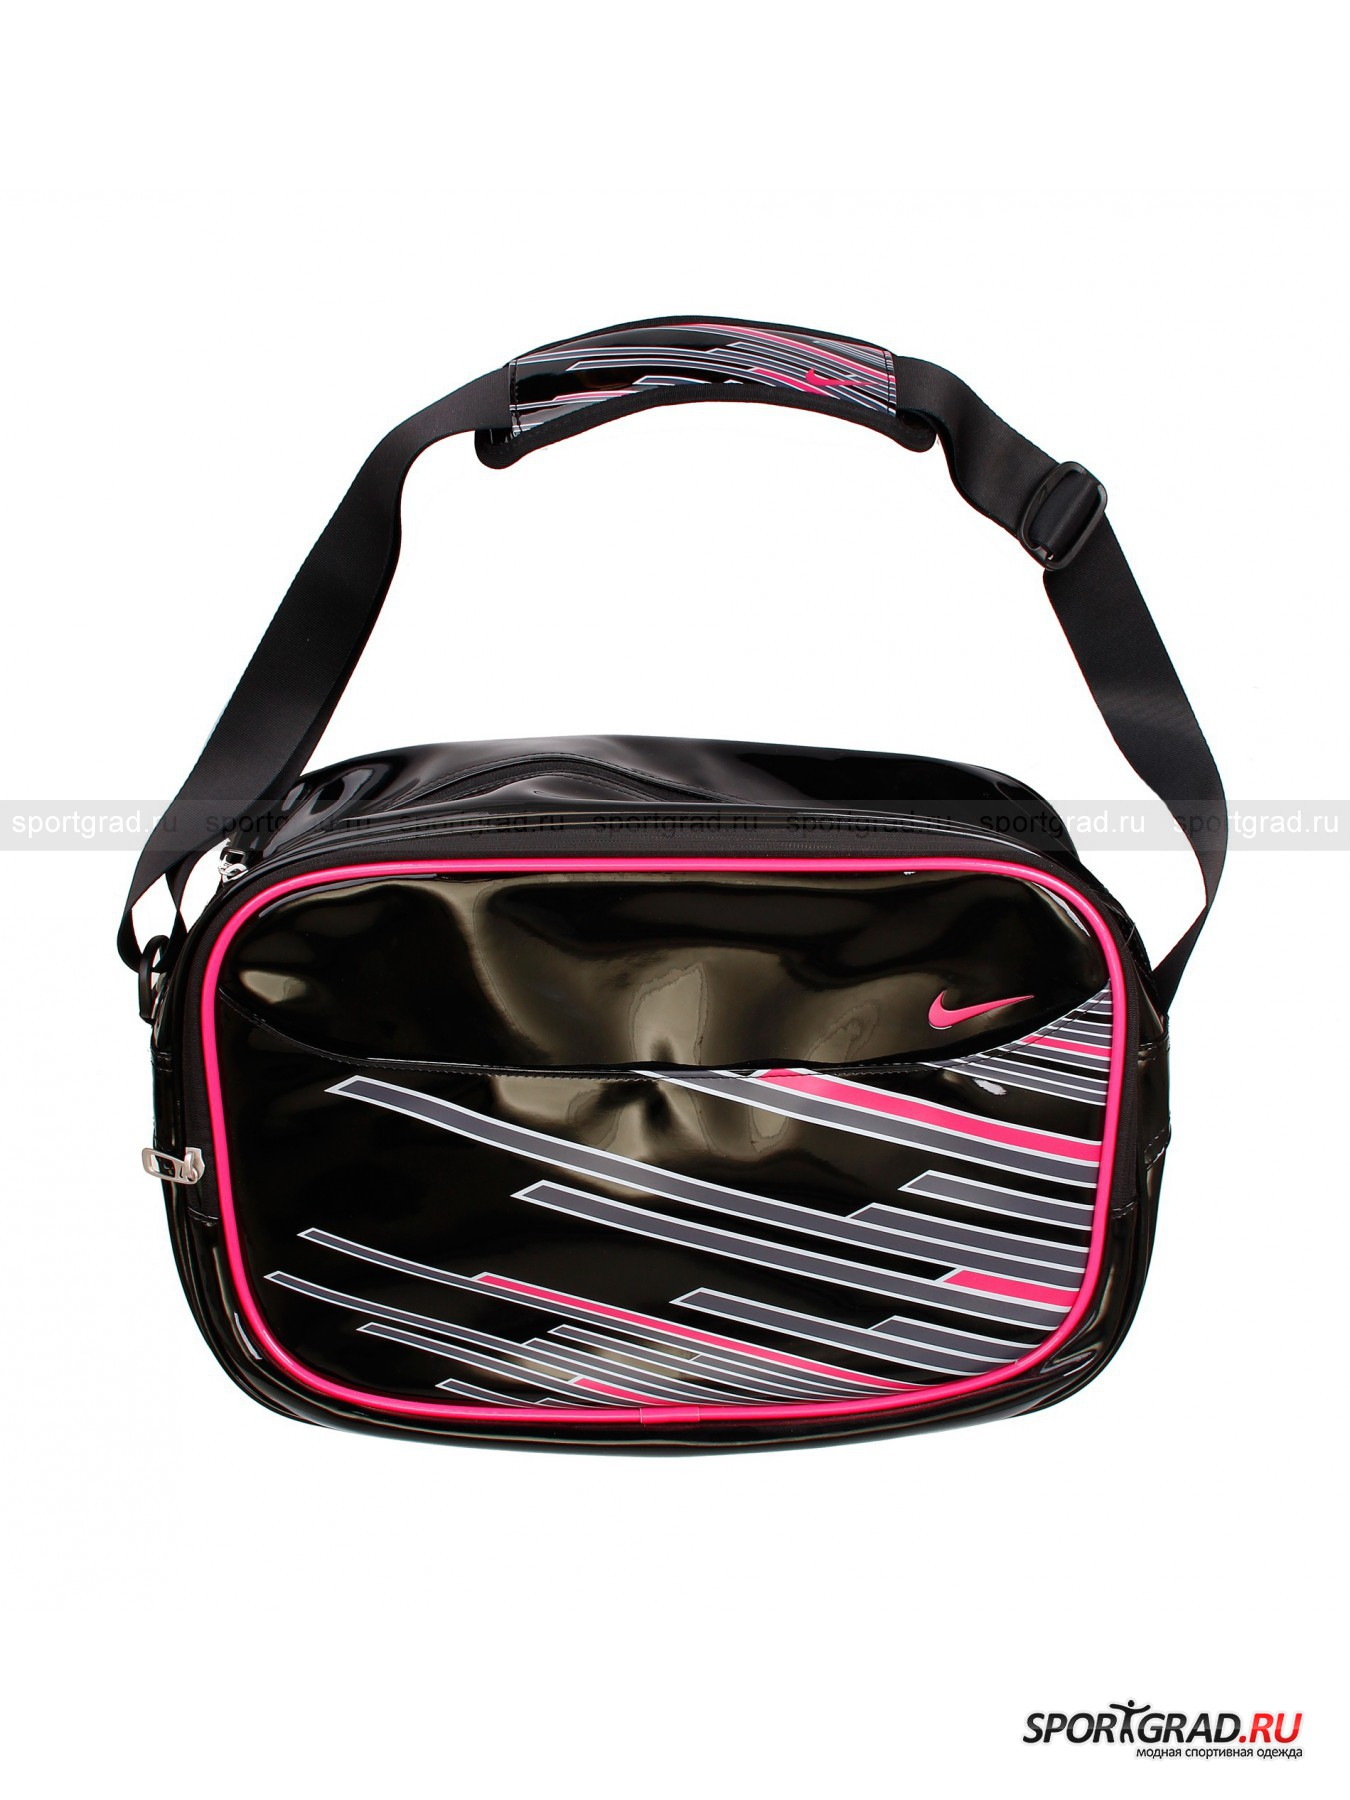 Сумка женская Nike Bukatsu Sister Bag от Спортград